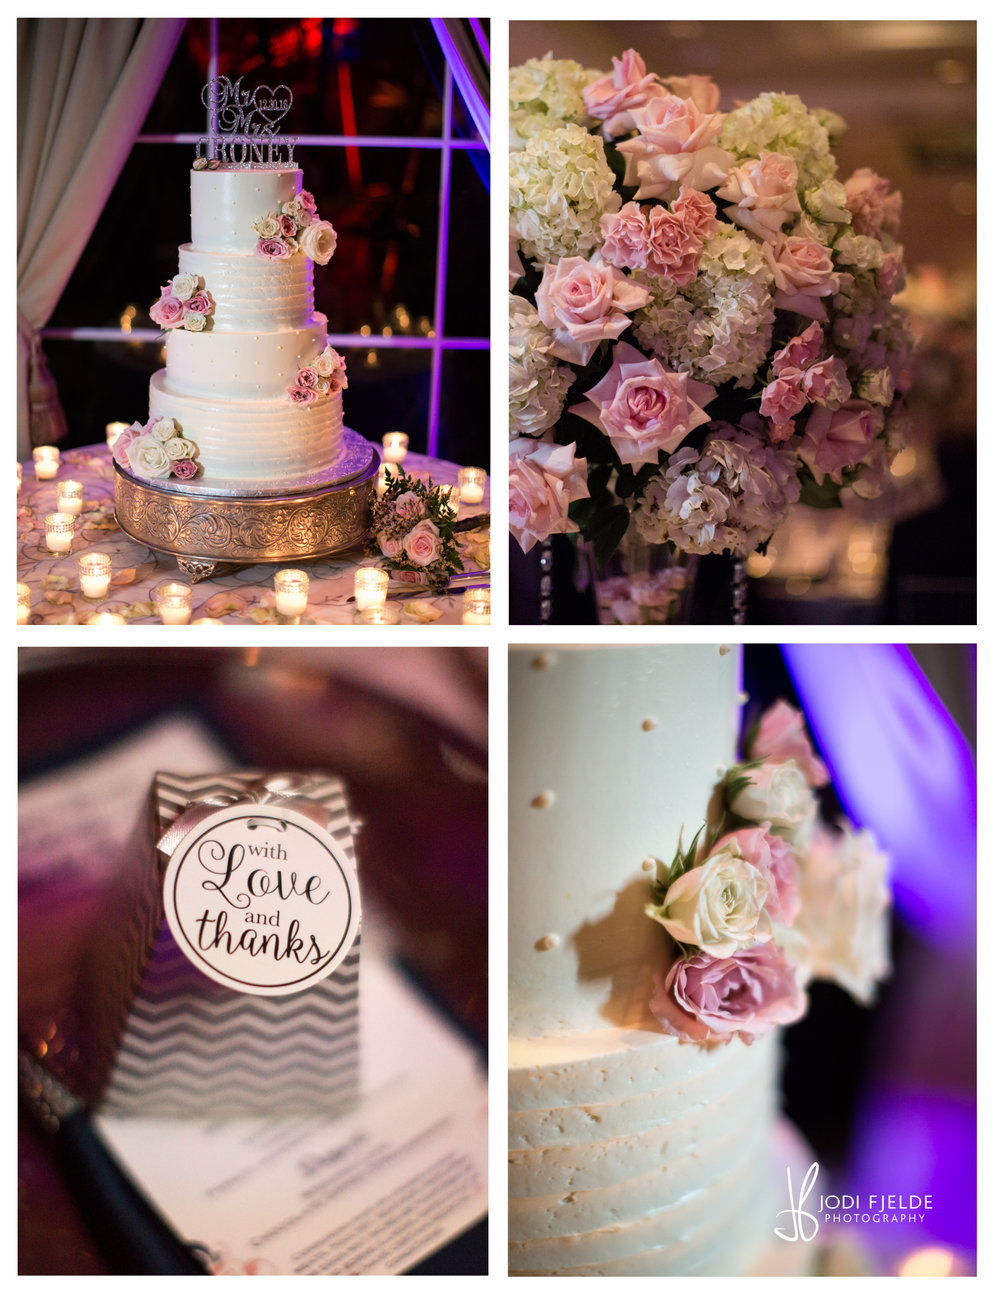 Benvenuto_wedding_Boynton_Beach_Jodi_Fjelde_Photography_Nikki_Otis_married_21.jpg